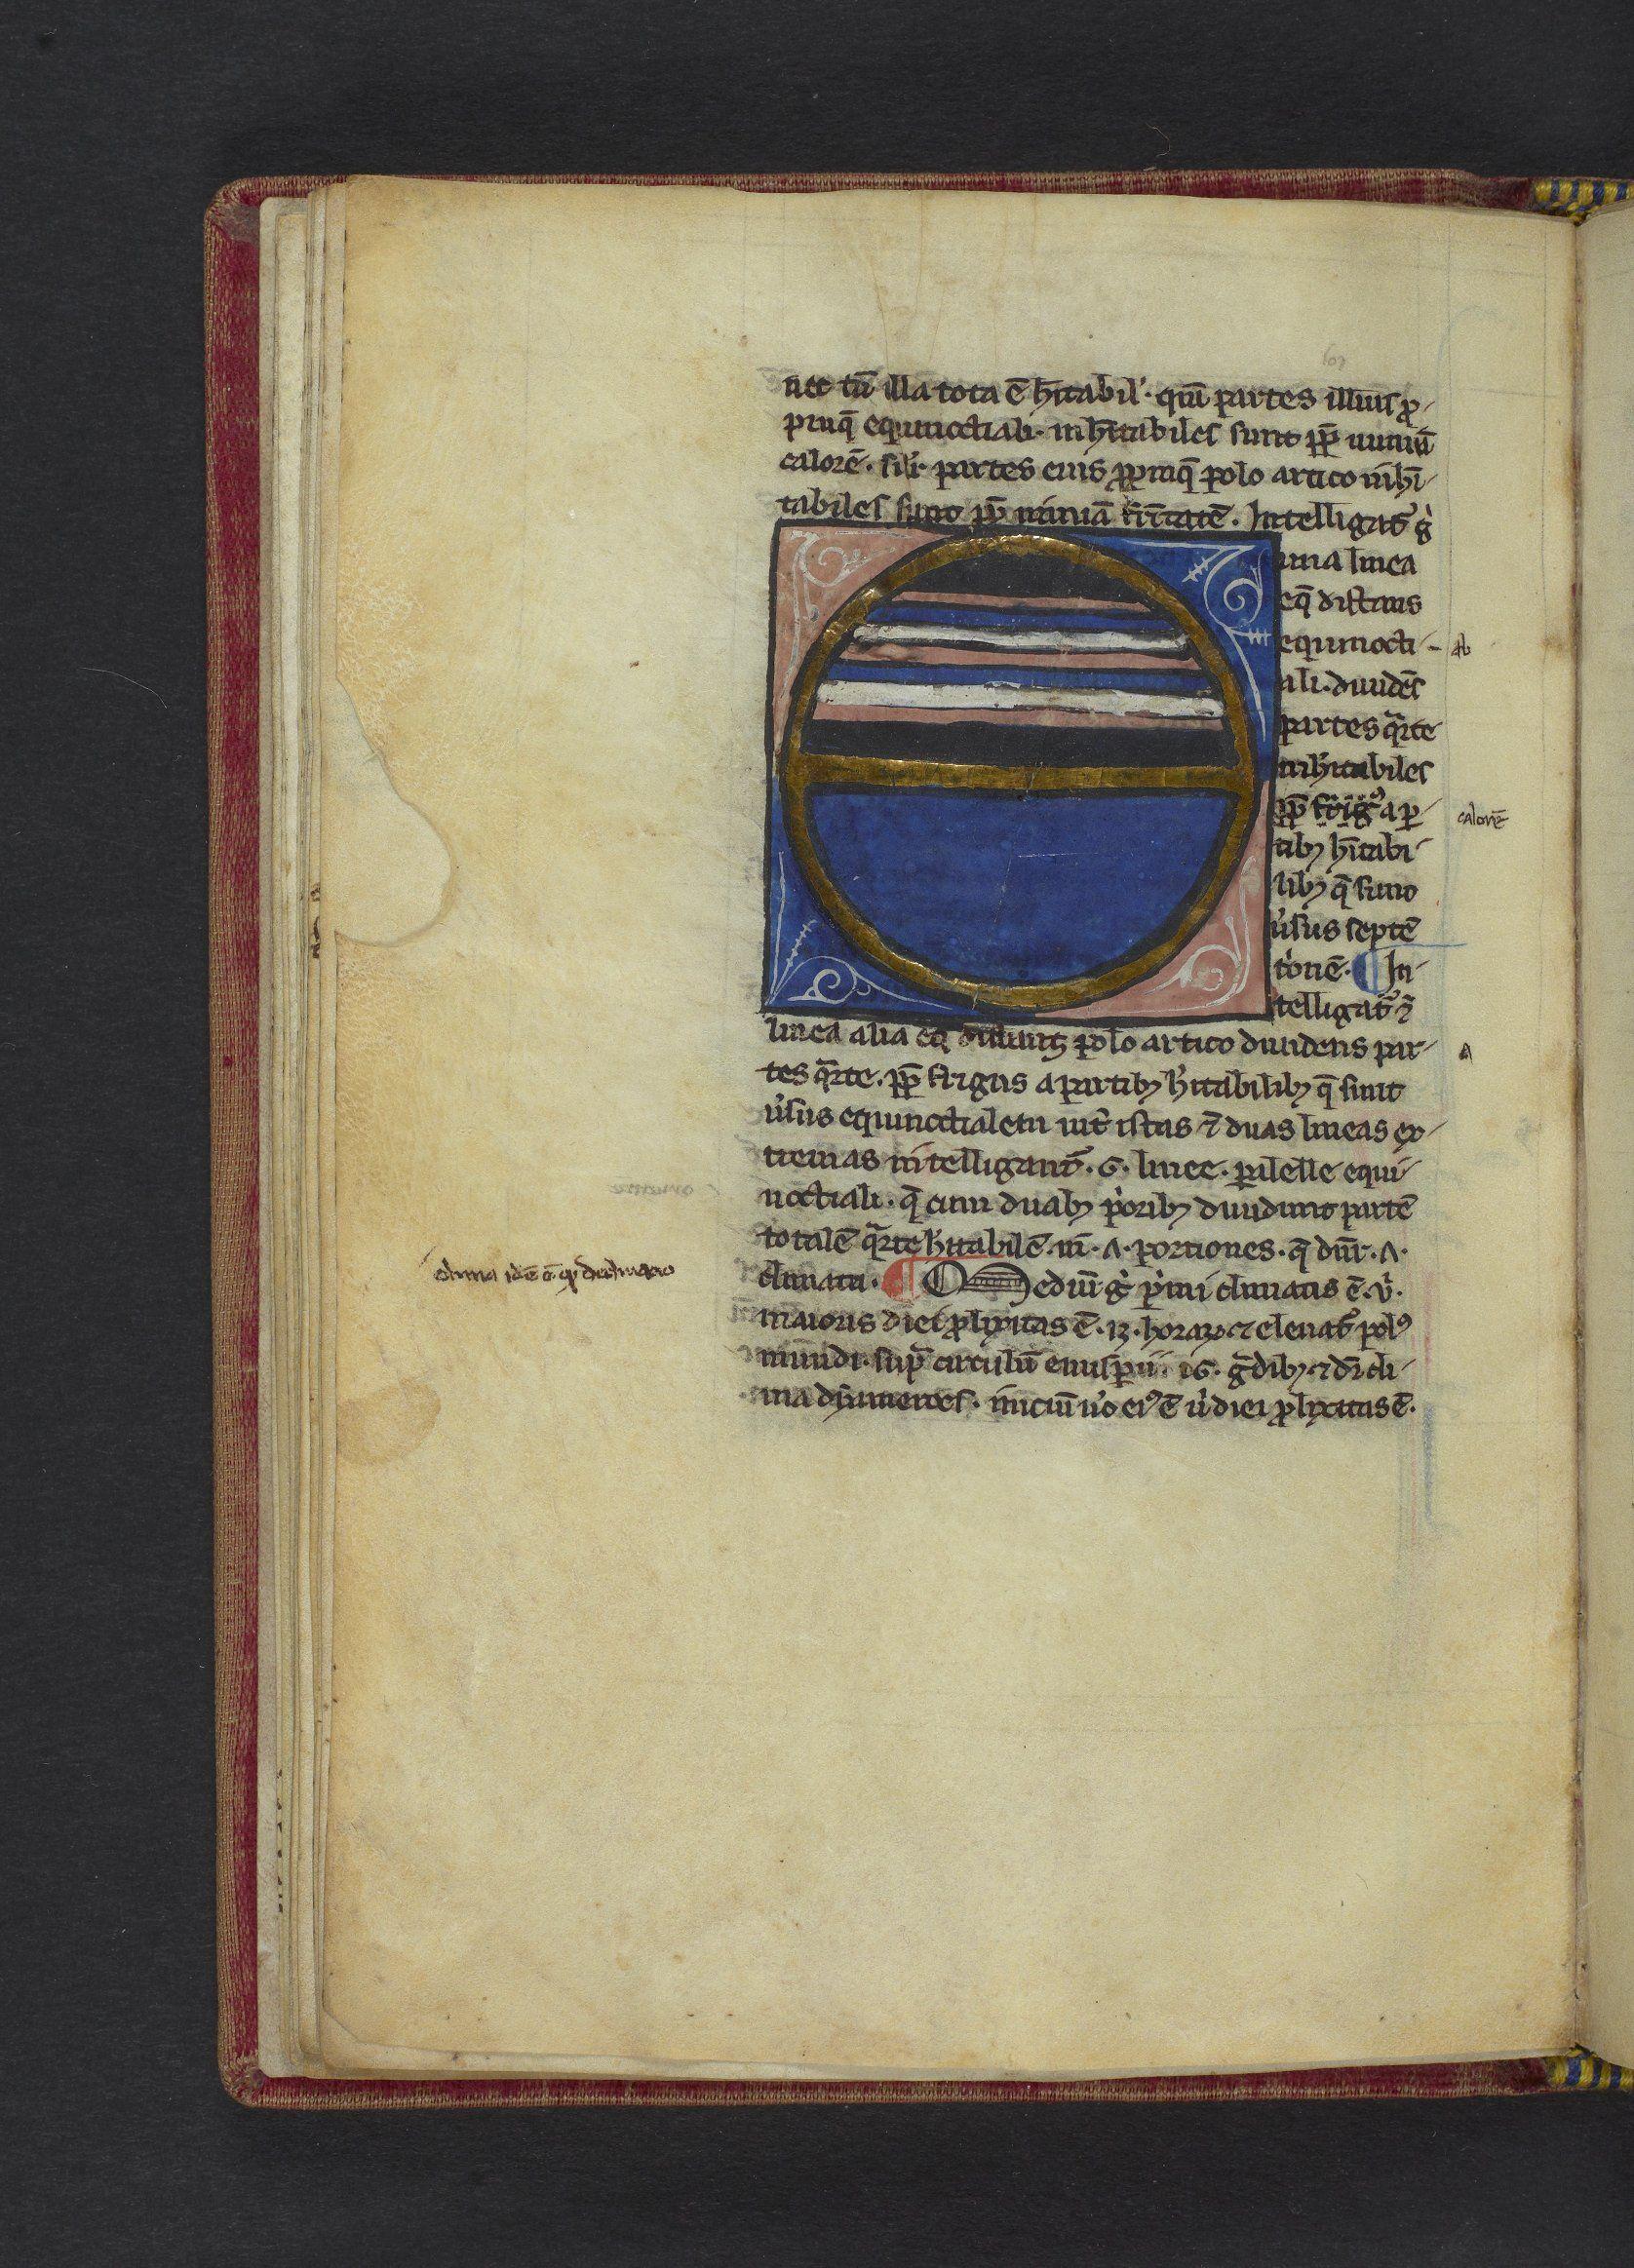 Lawrence J. Schoenberg Collection: LJS 216 - Sacro Bosco, Joannes de, active 1230 - Tractatum de spera ... [etc.]